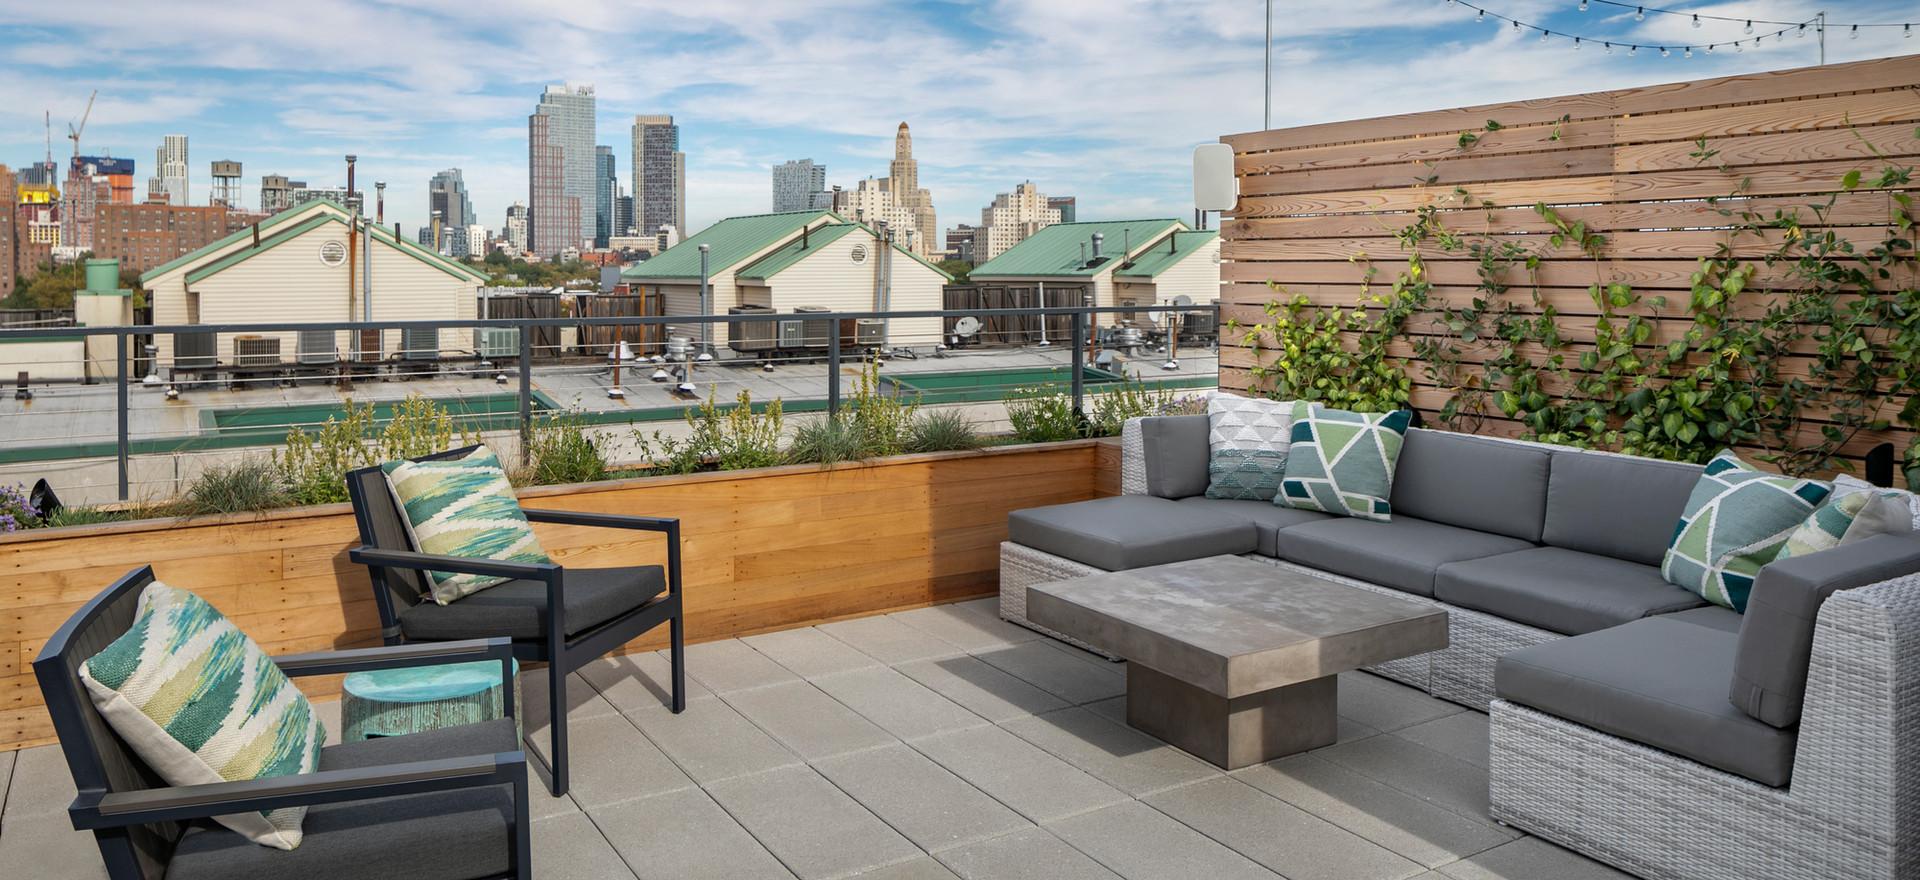 Staghorn Modern Brooklyn Rooftop Garden